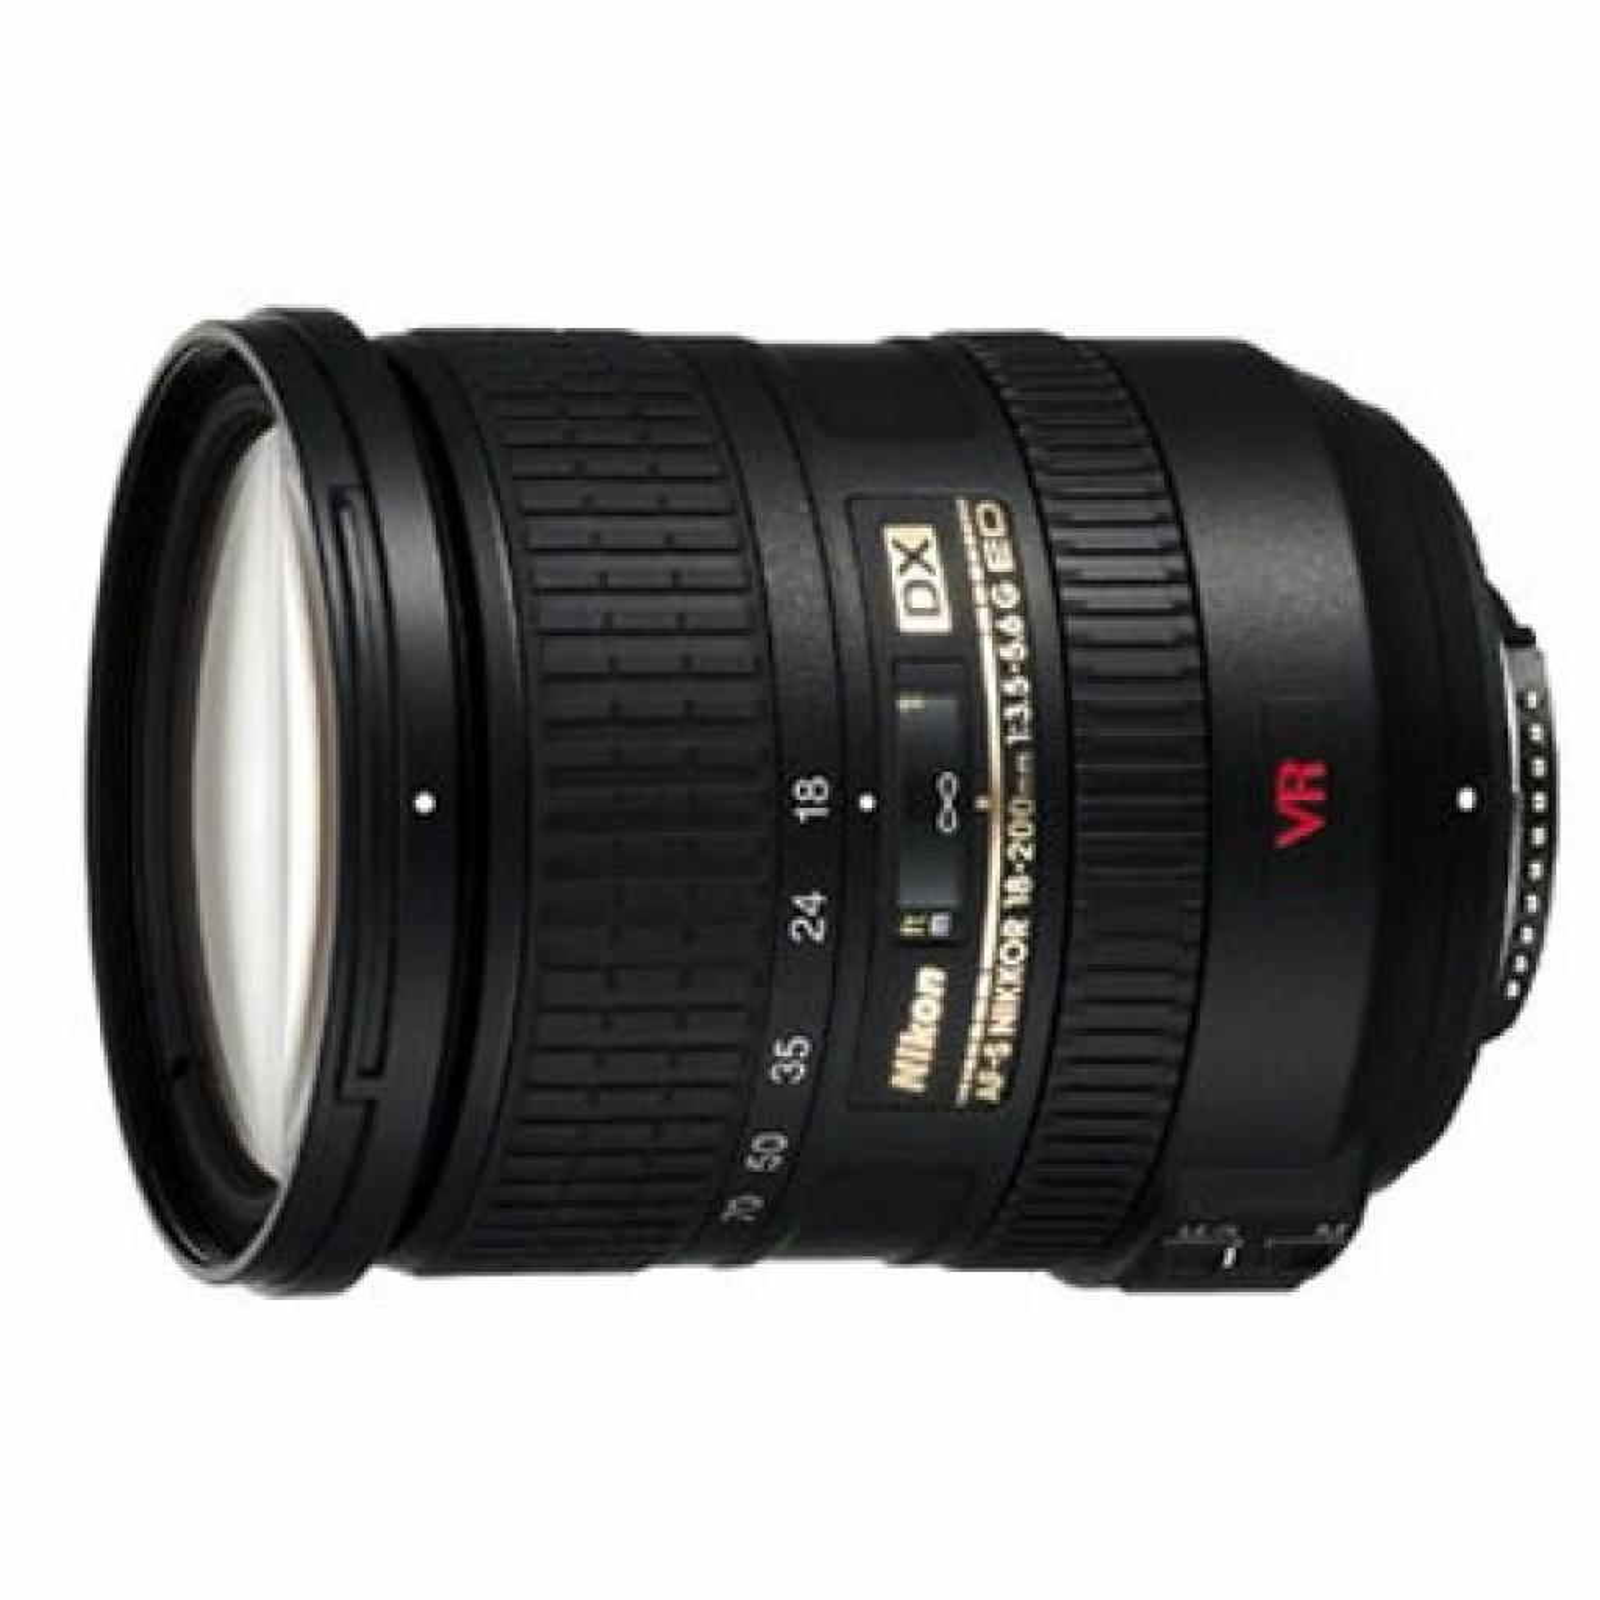 Объектив Tamron AF 18-200mm f/3.5-6.3 XR Di II LD Asp. (IF) macro for Nikon (AF 18-200mm for Nikon)